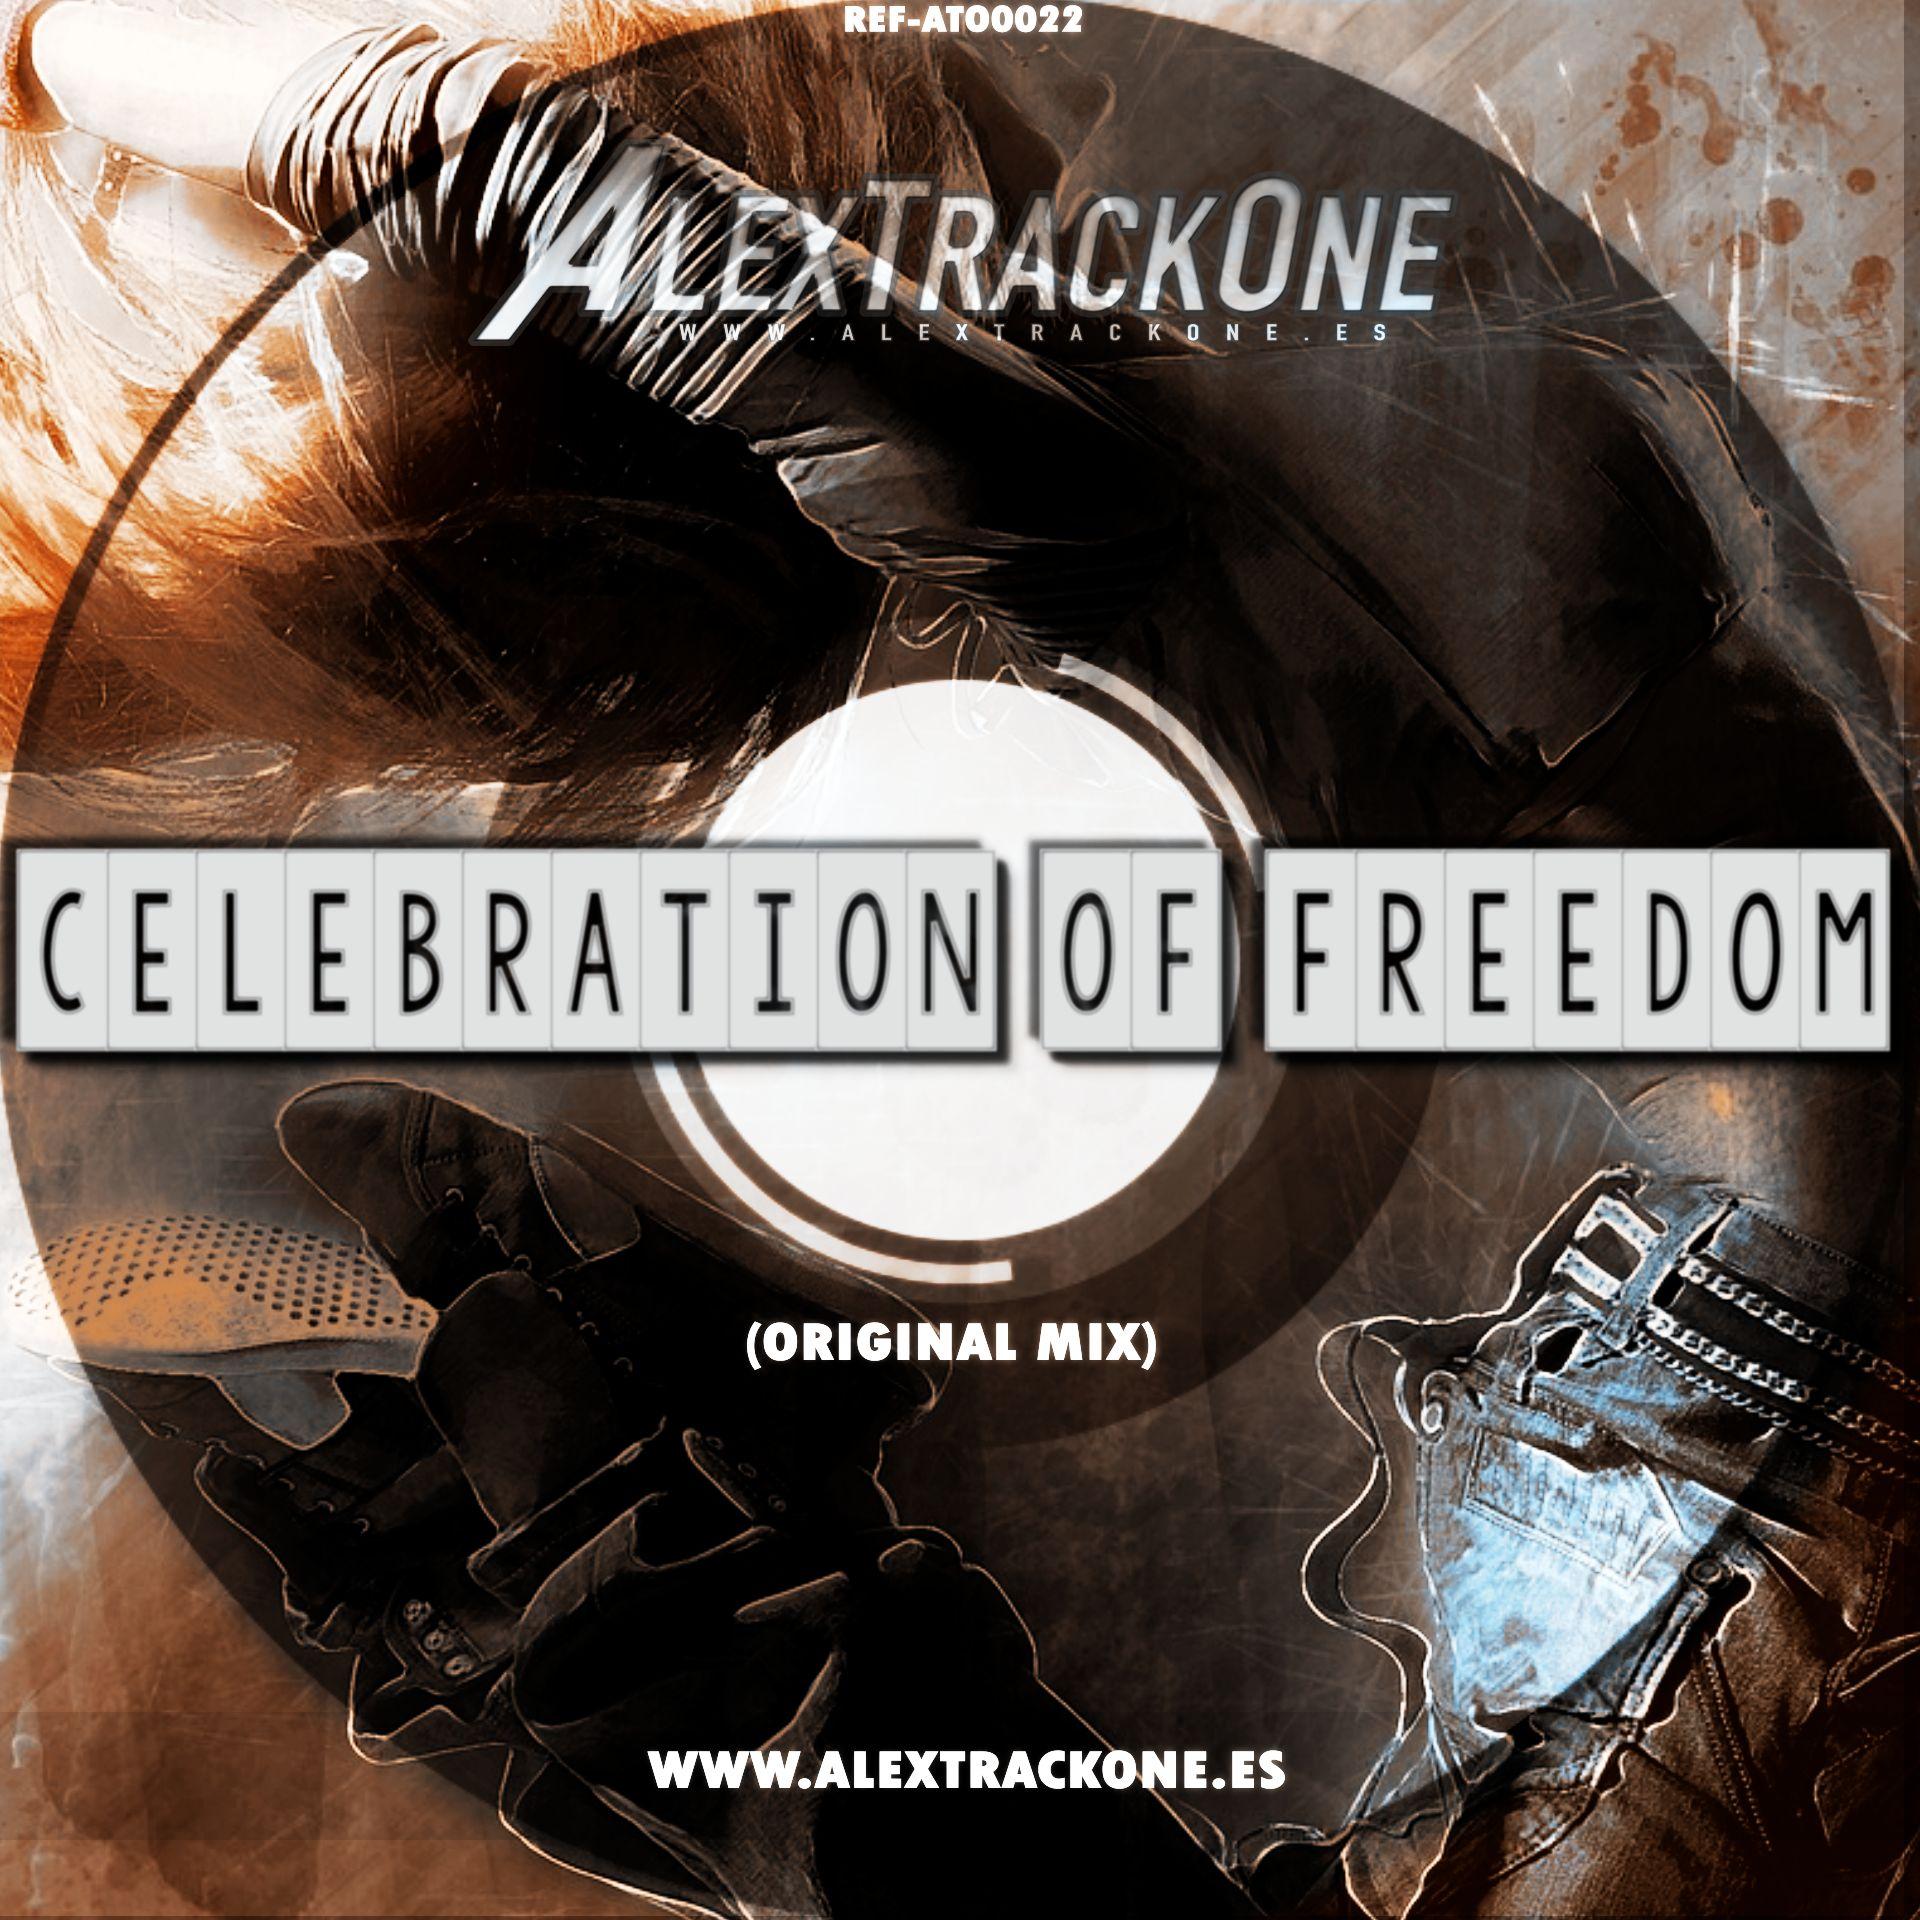 REF-ATO0022 CELEBRATION OF FREEDOM (ORIGINAL MIX) (MP3 & WAV)